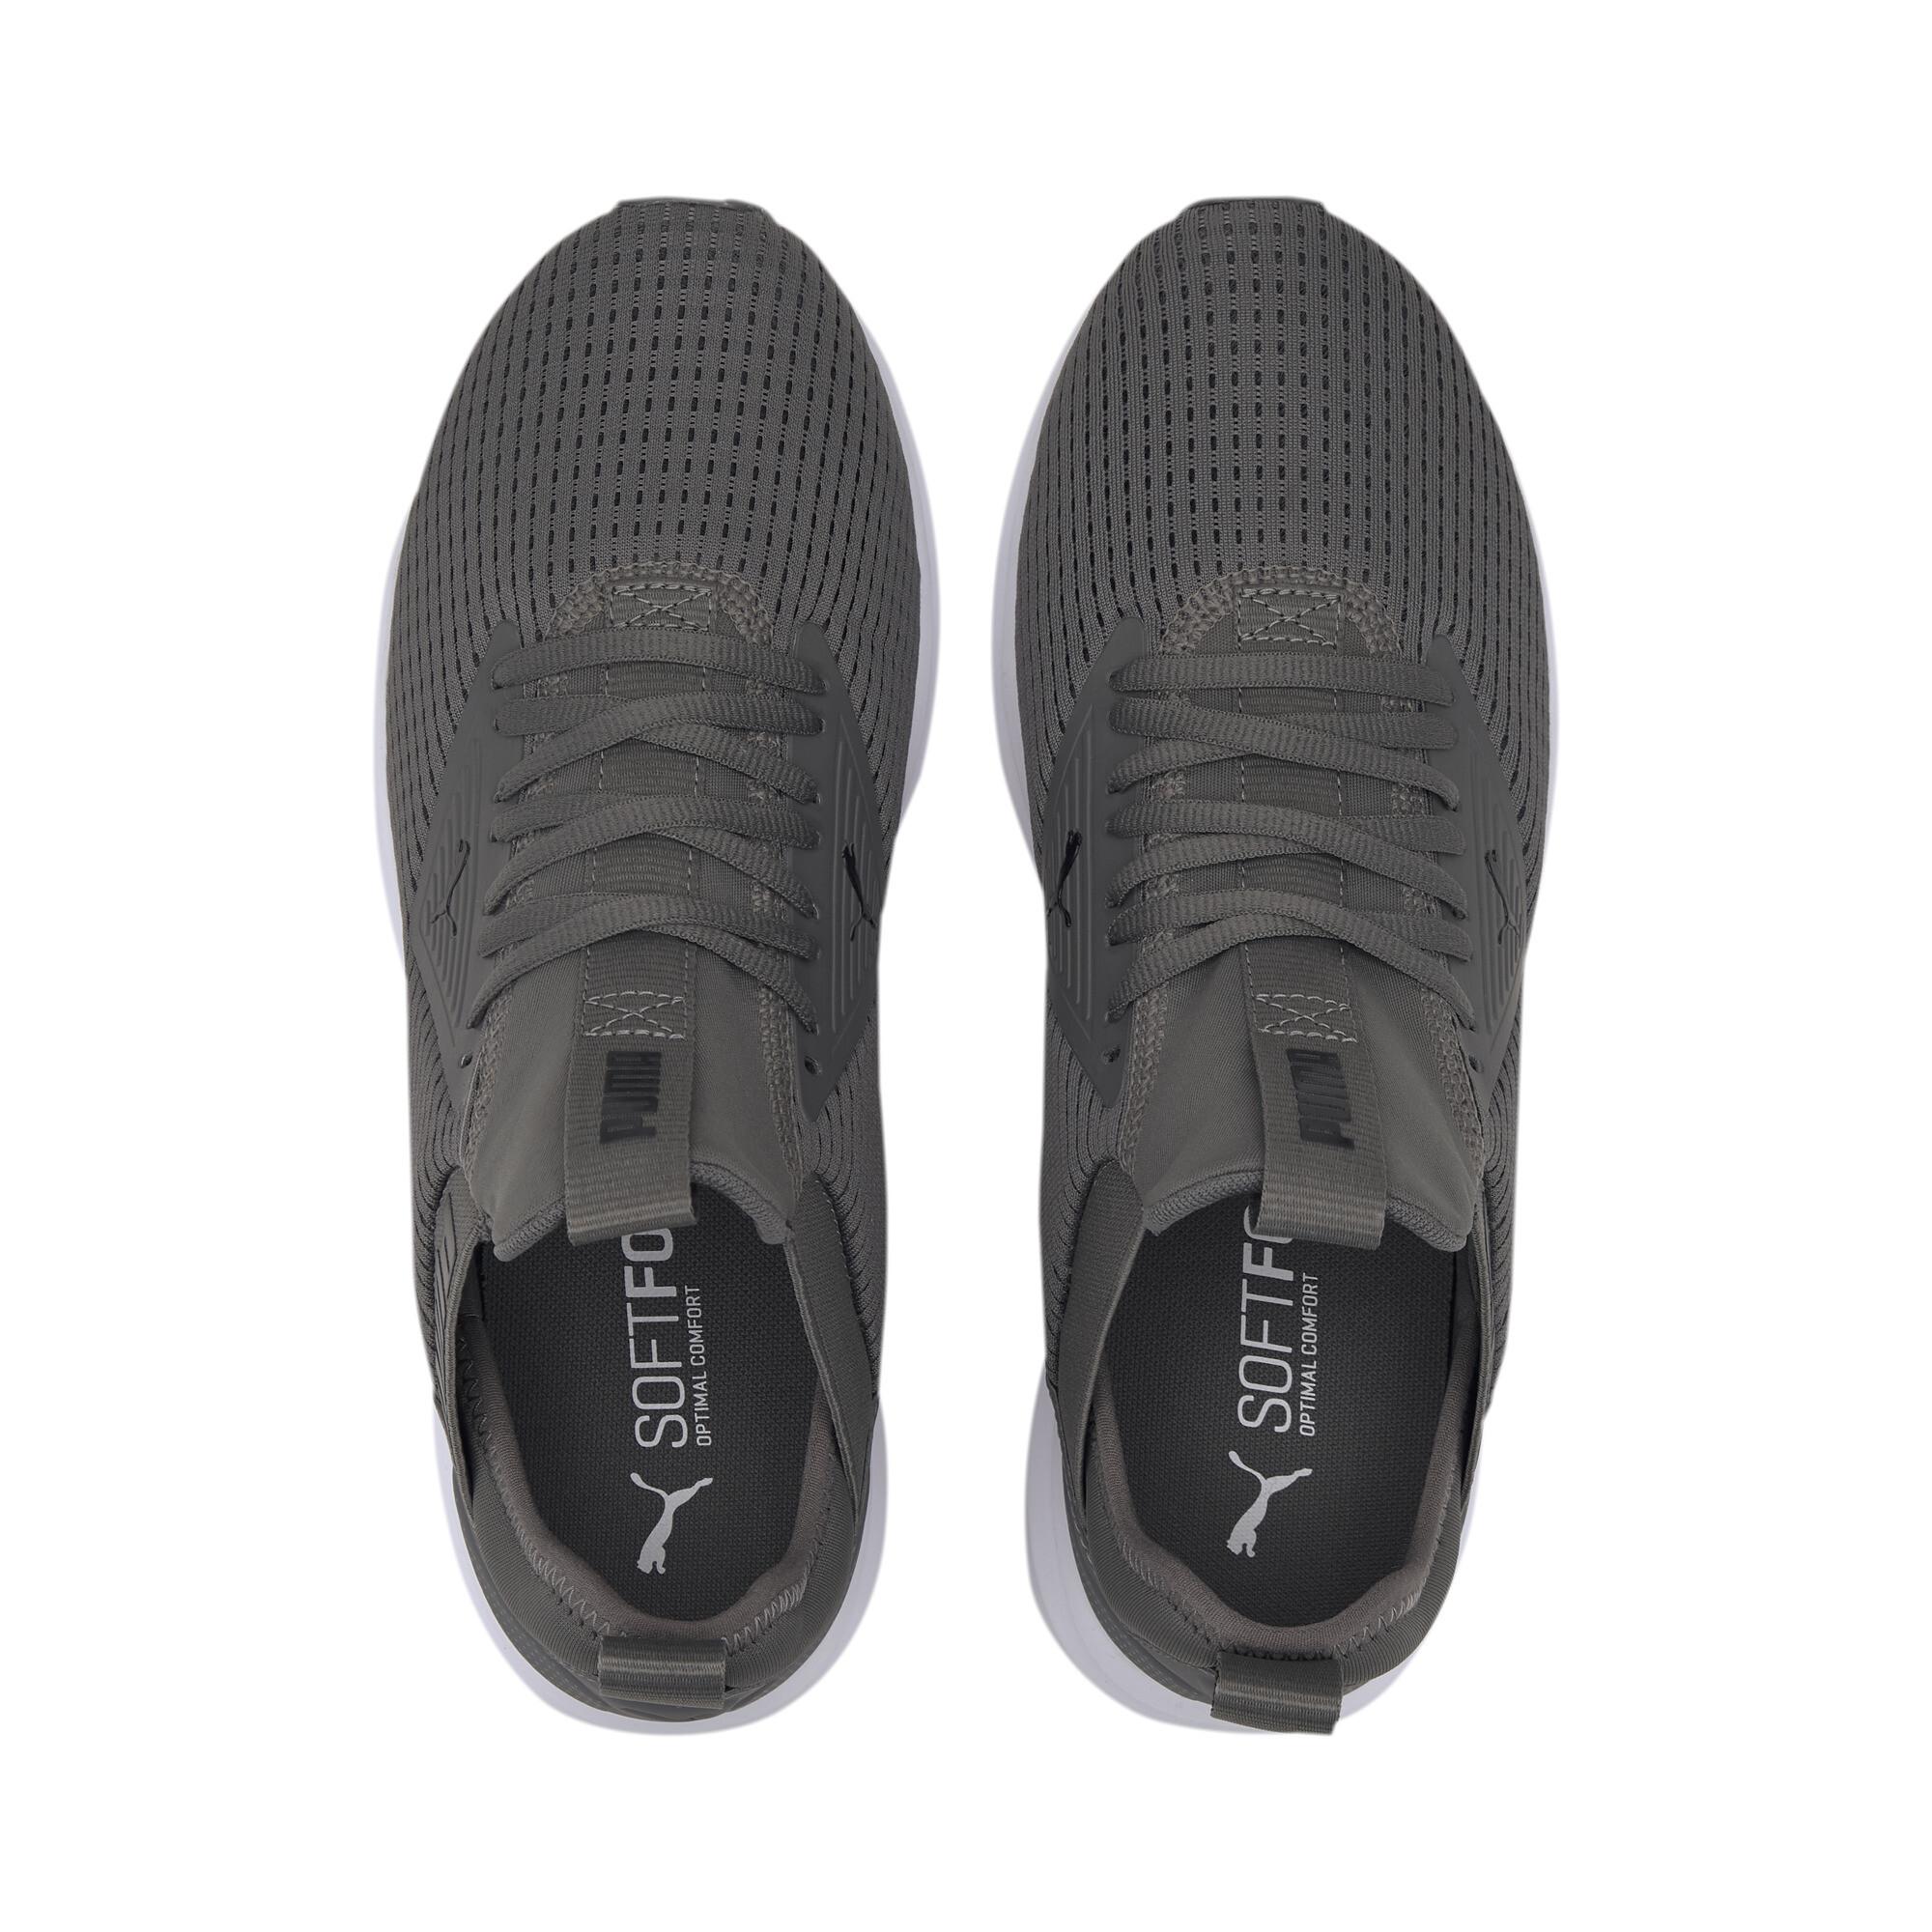 PUMA-Men-039-s-Enzo-Beta-Mesh-Training-Shoes thumbnail 15